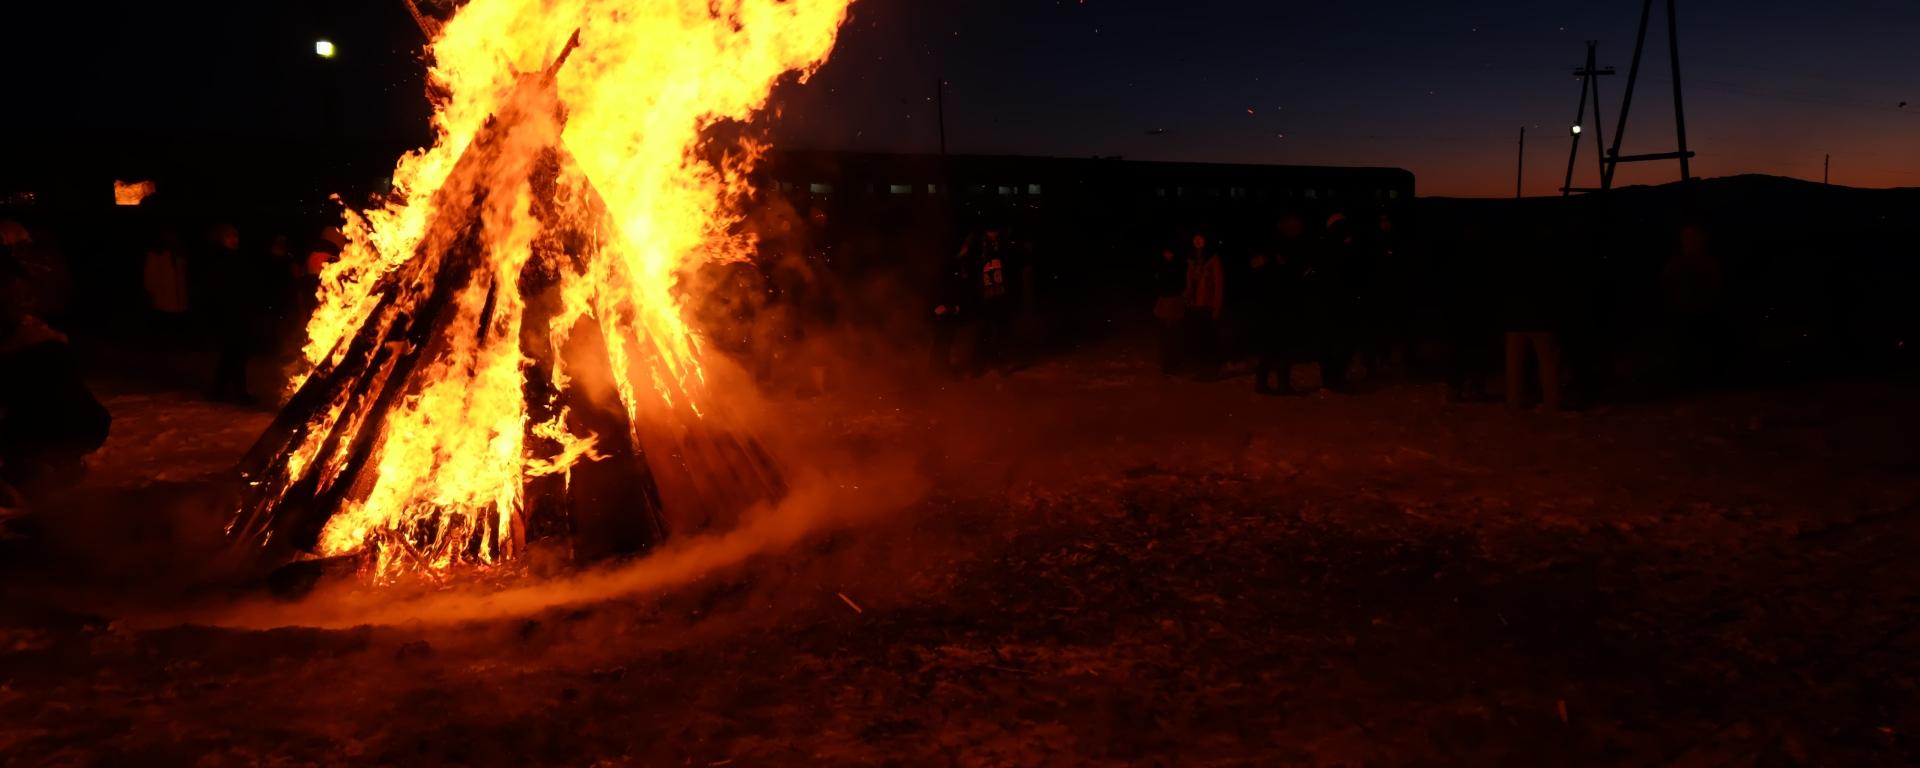 mongolia, new year, travel